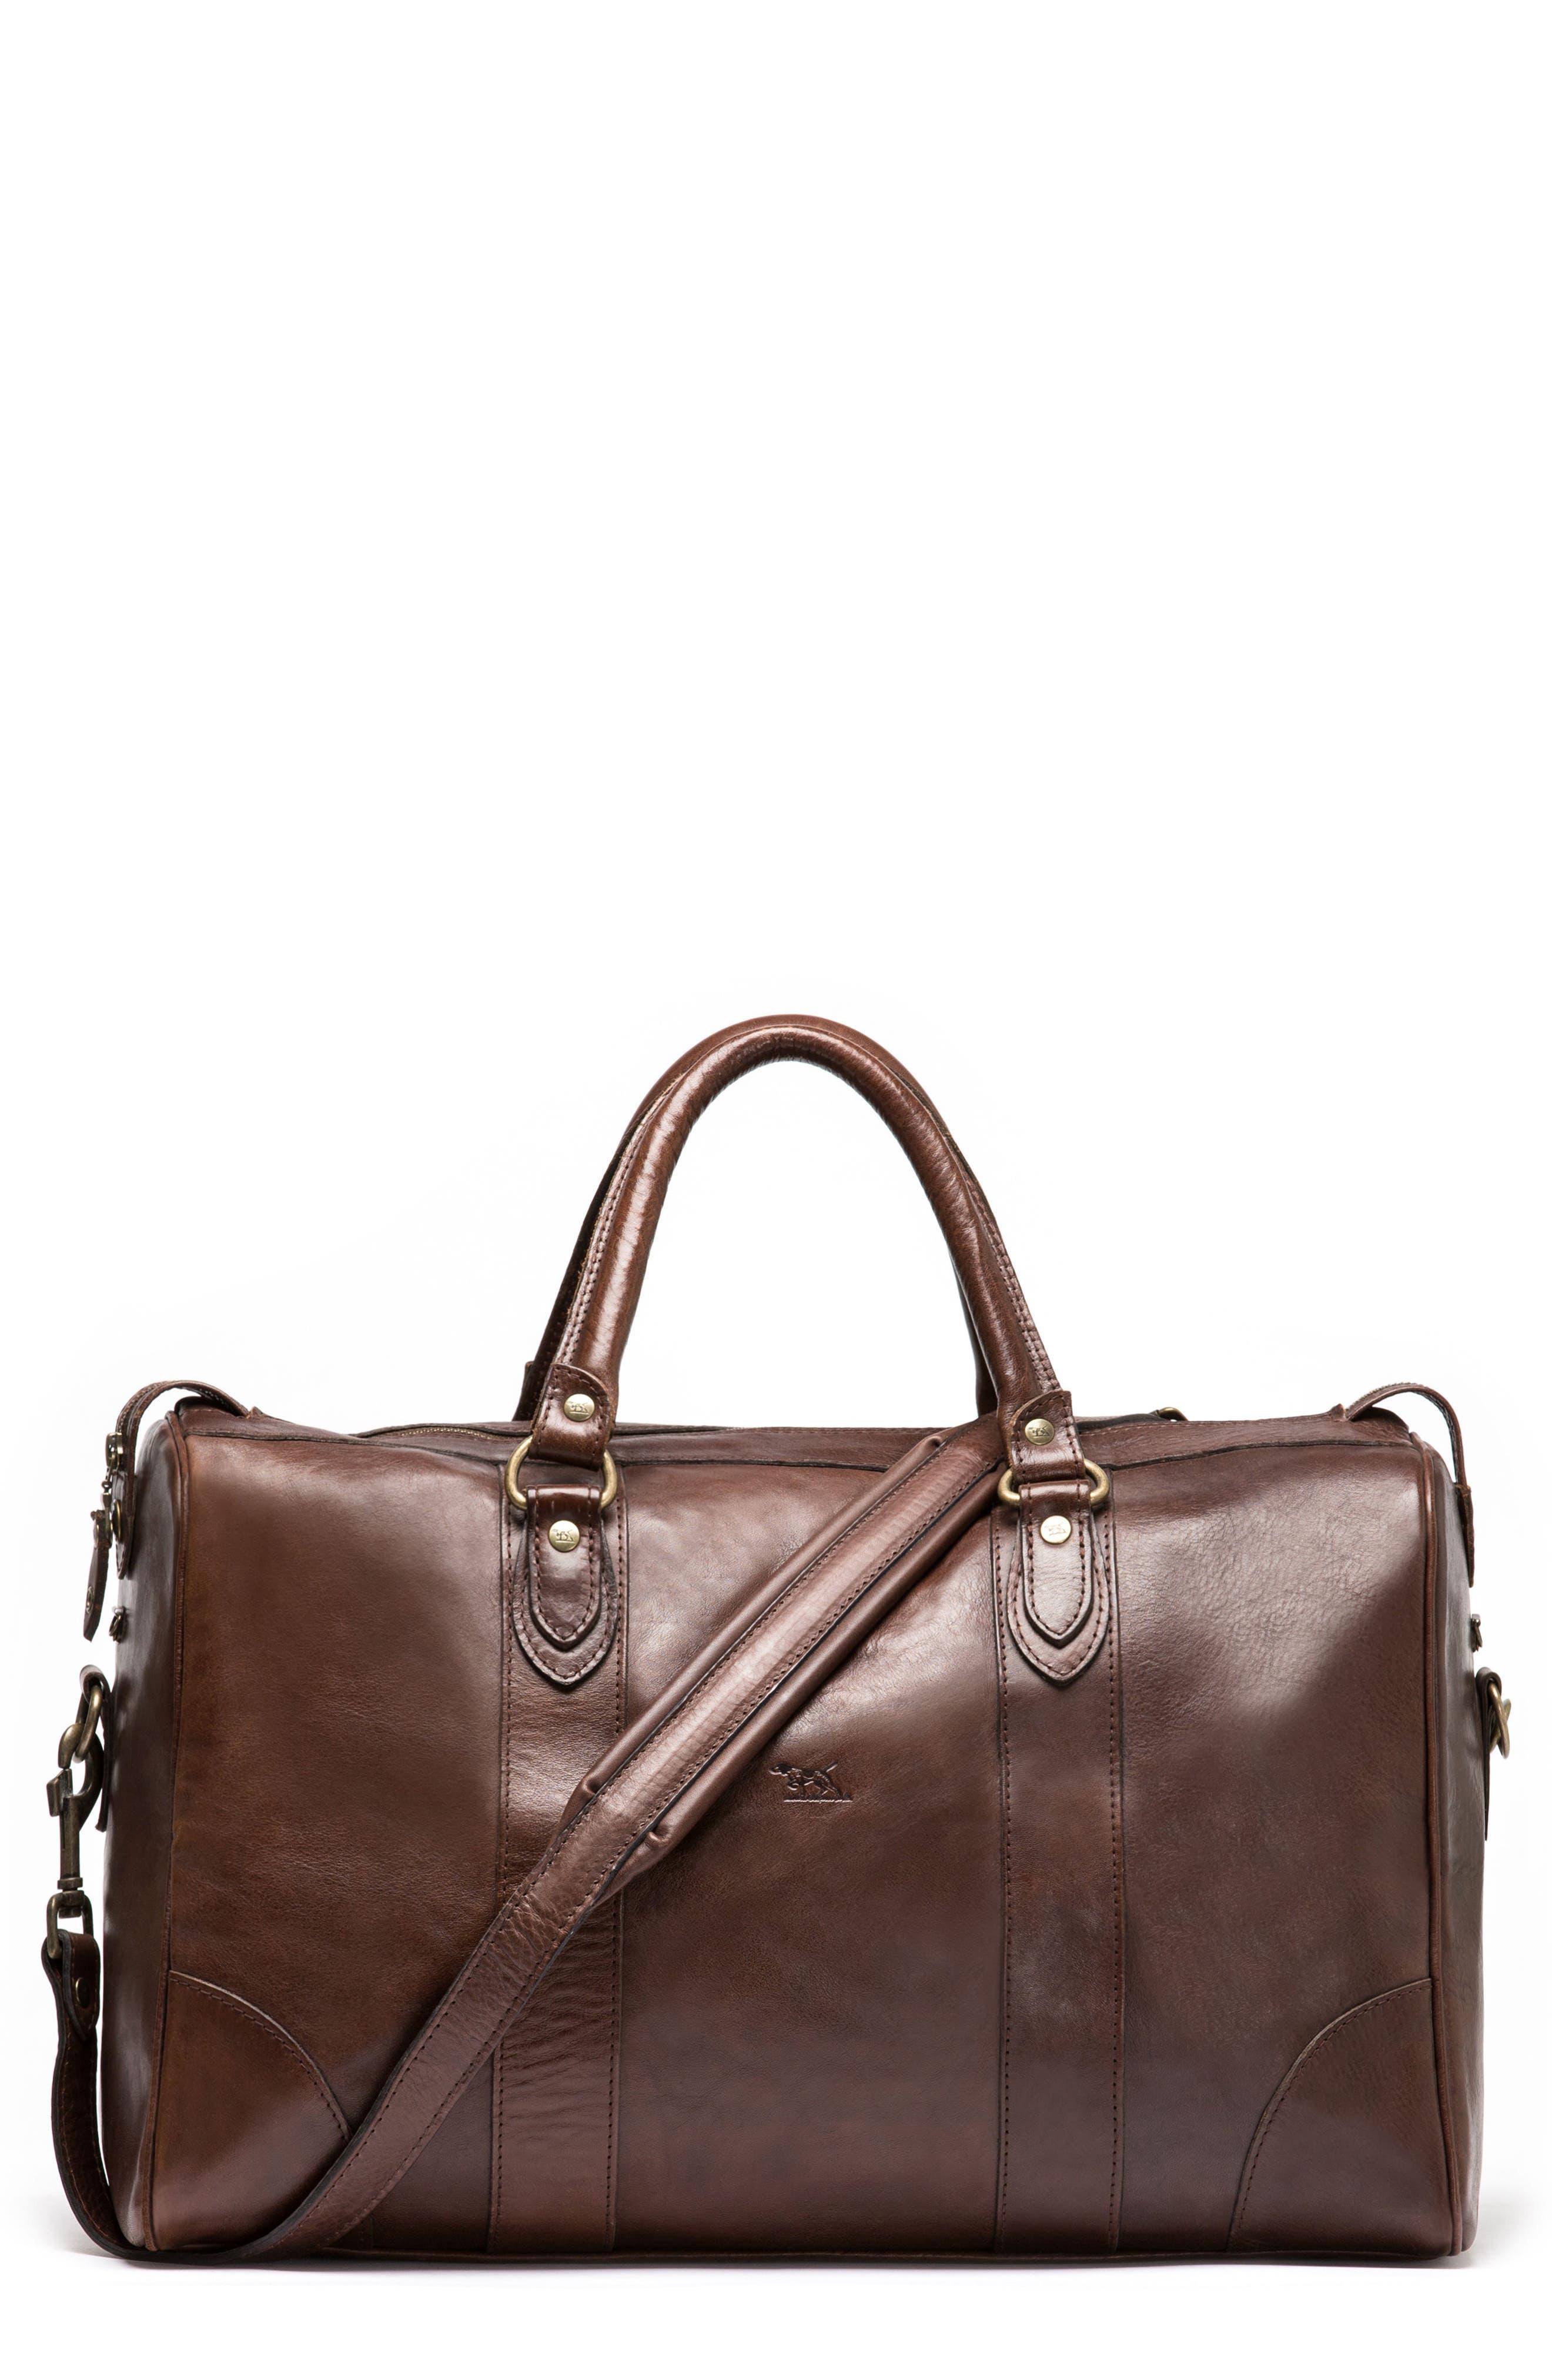 Alternate Image 1 Selected - Rodd & Gunn Normanby Duffel Bag